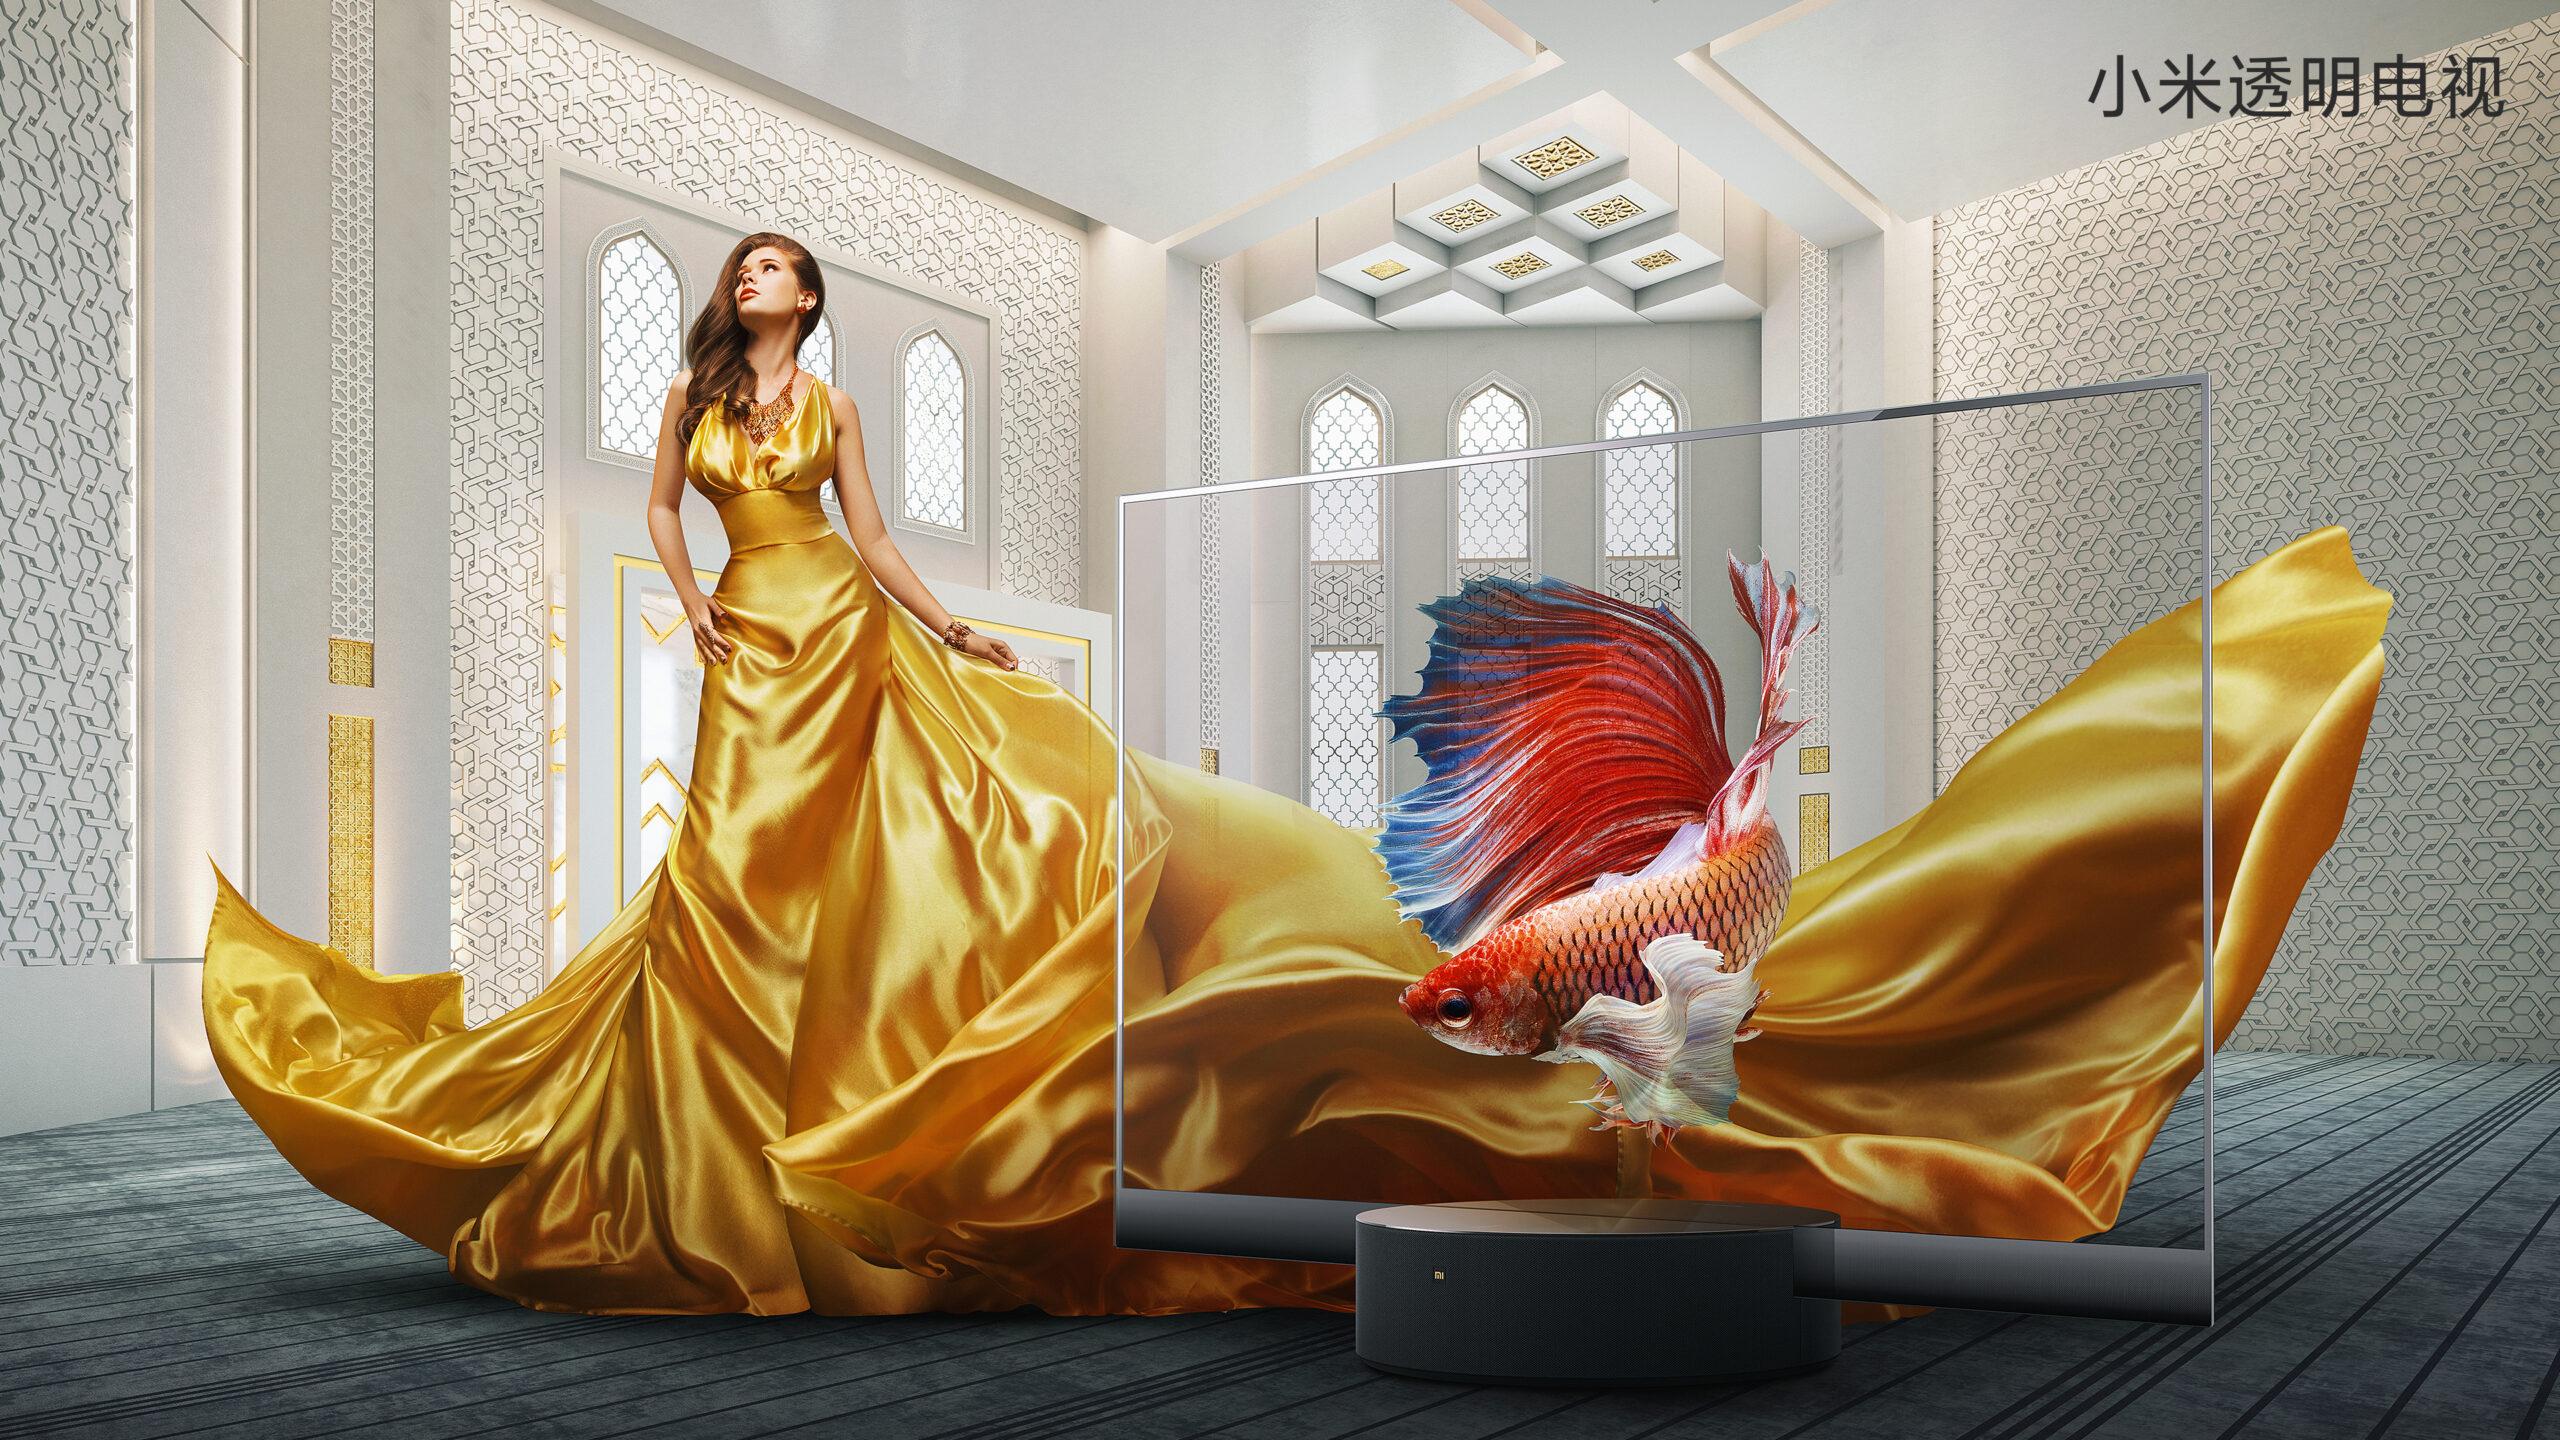 Mi TV LUX OLED Transparent Edition 015 scaled